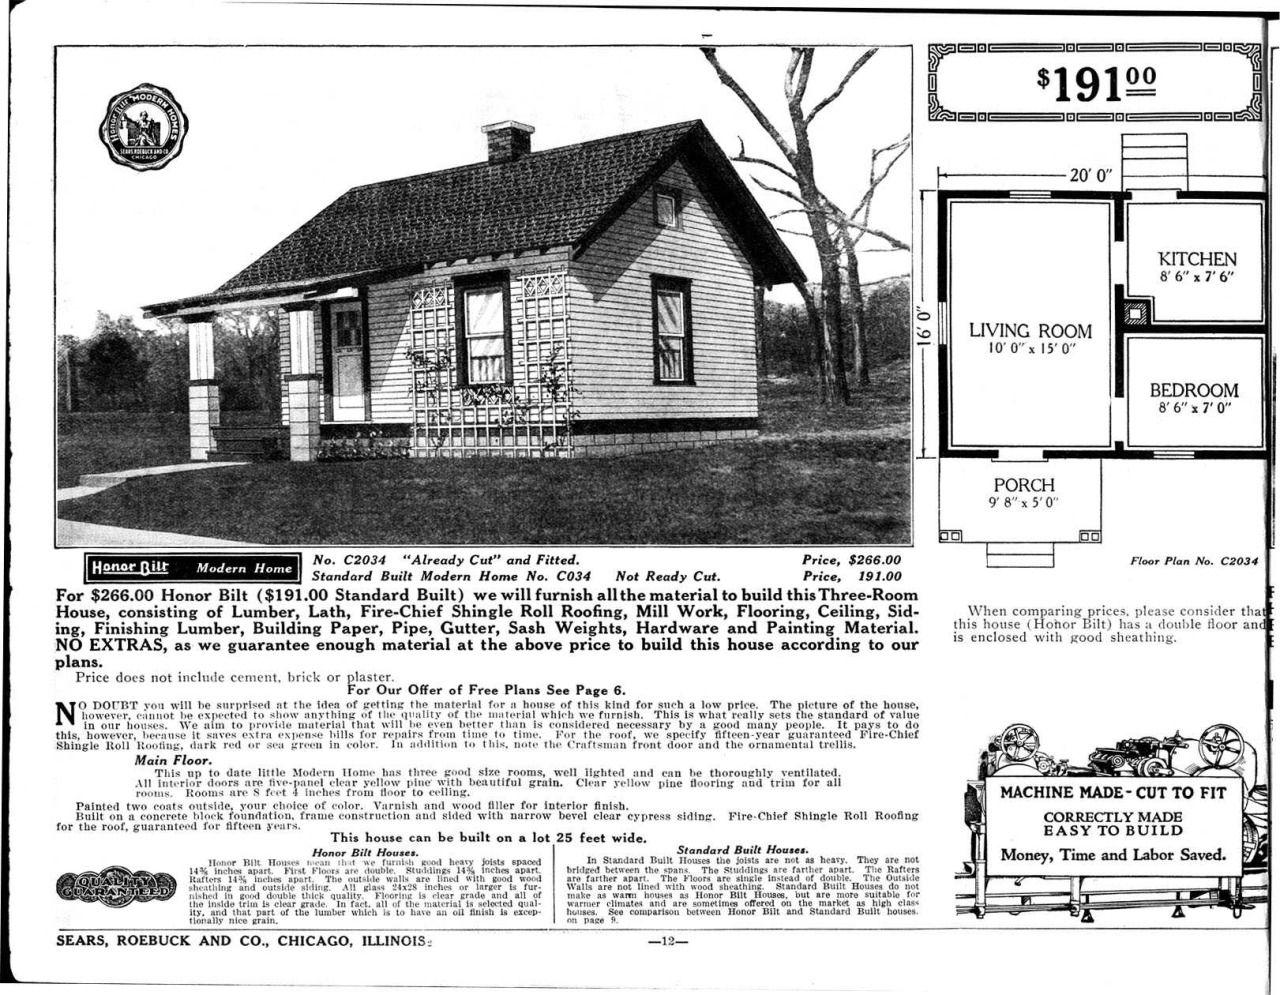 Sears Homes 1915-1920 - 320 sf - The Natoma (Model No ...